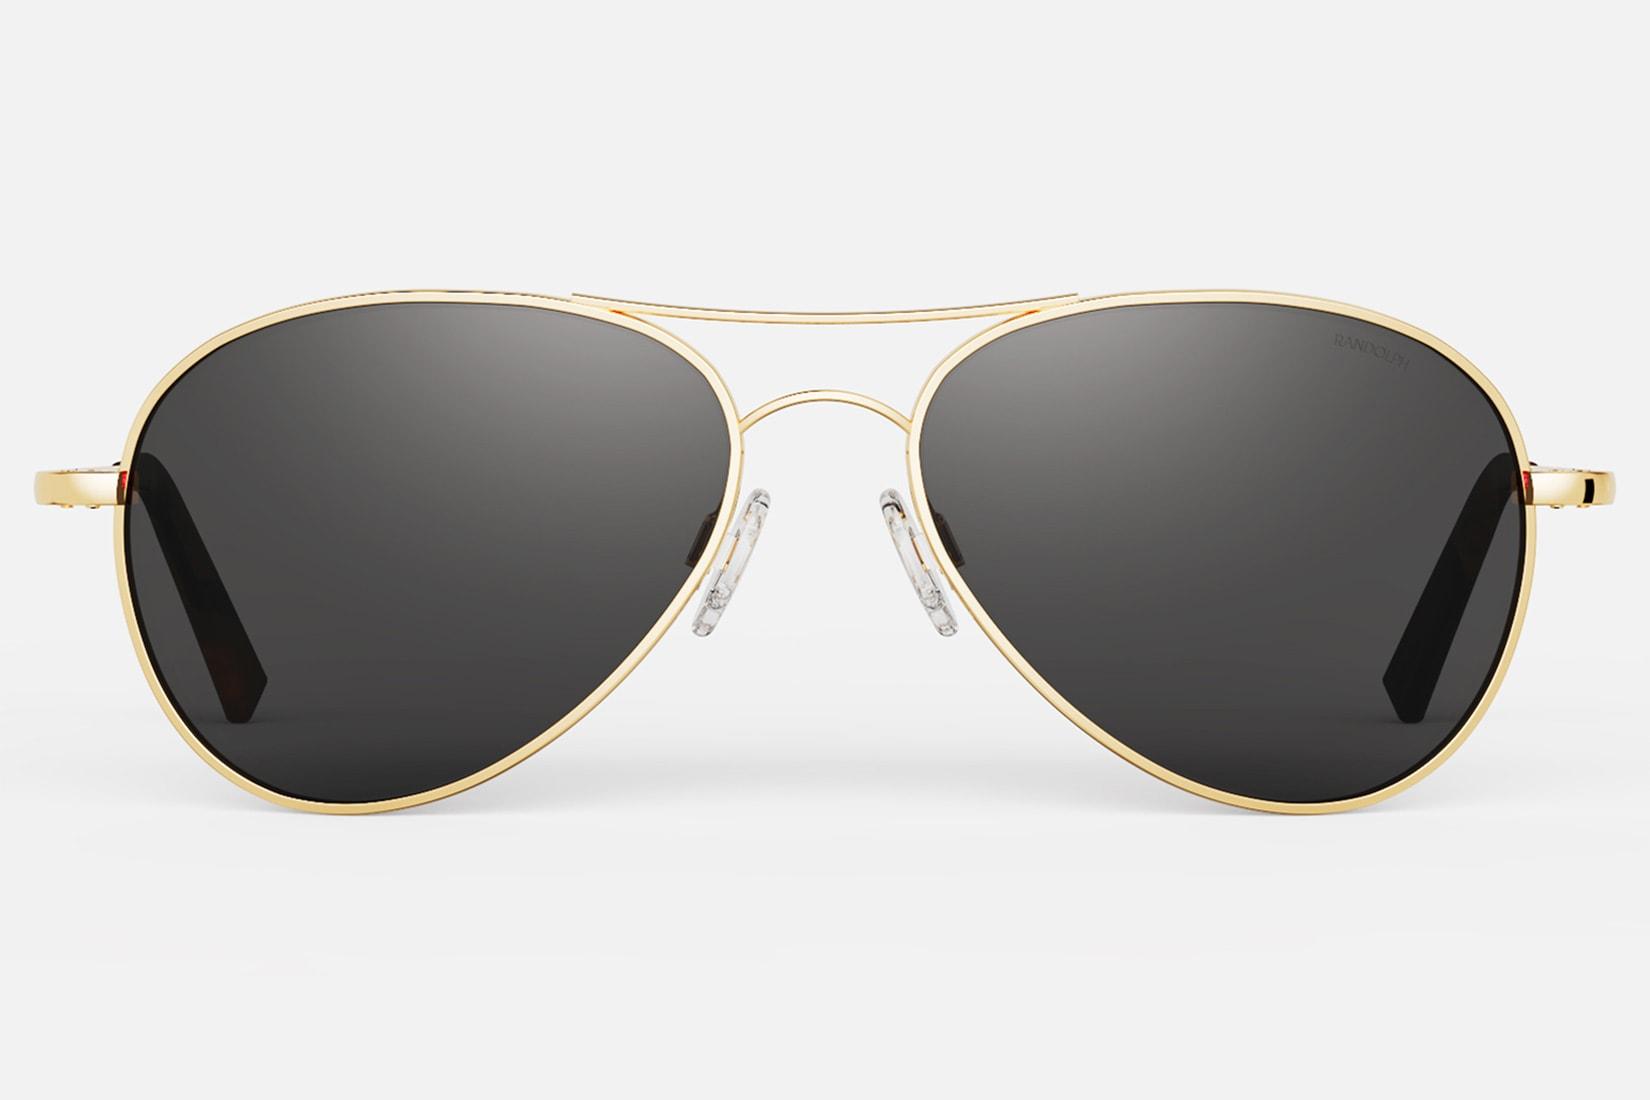 Randolph USA amelia women sunglasses review - Luxe Digital